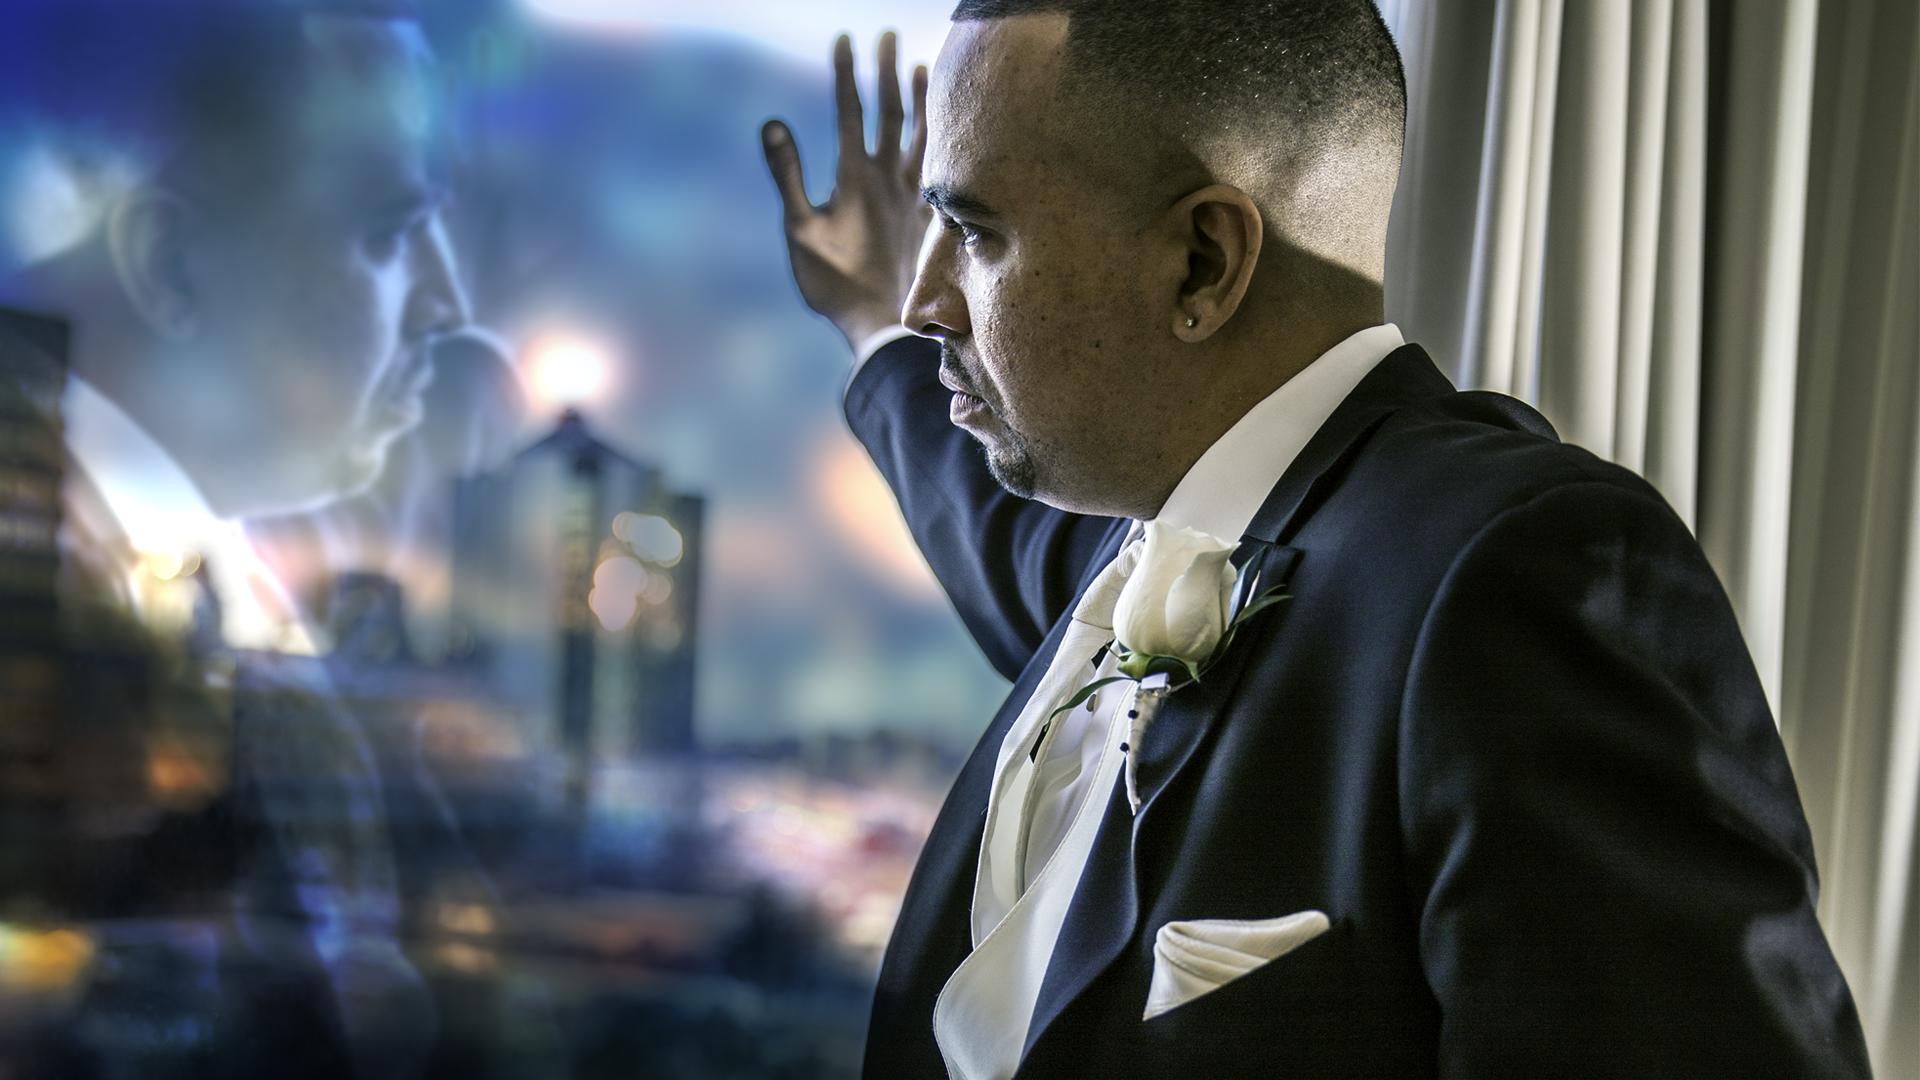 epic_sky_pictures_heads_groomtobe_closeup_eshoot_gq_ivan_anoop_wedding_fashion_male_model_maxim_toronto_vancouver_ontario_photography_services